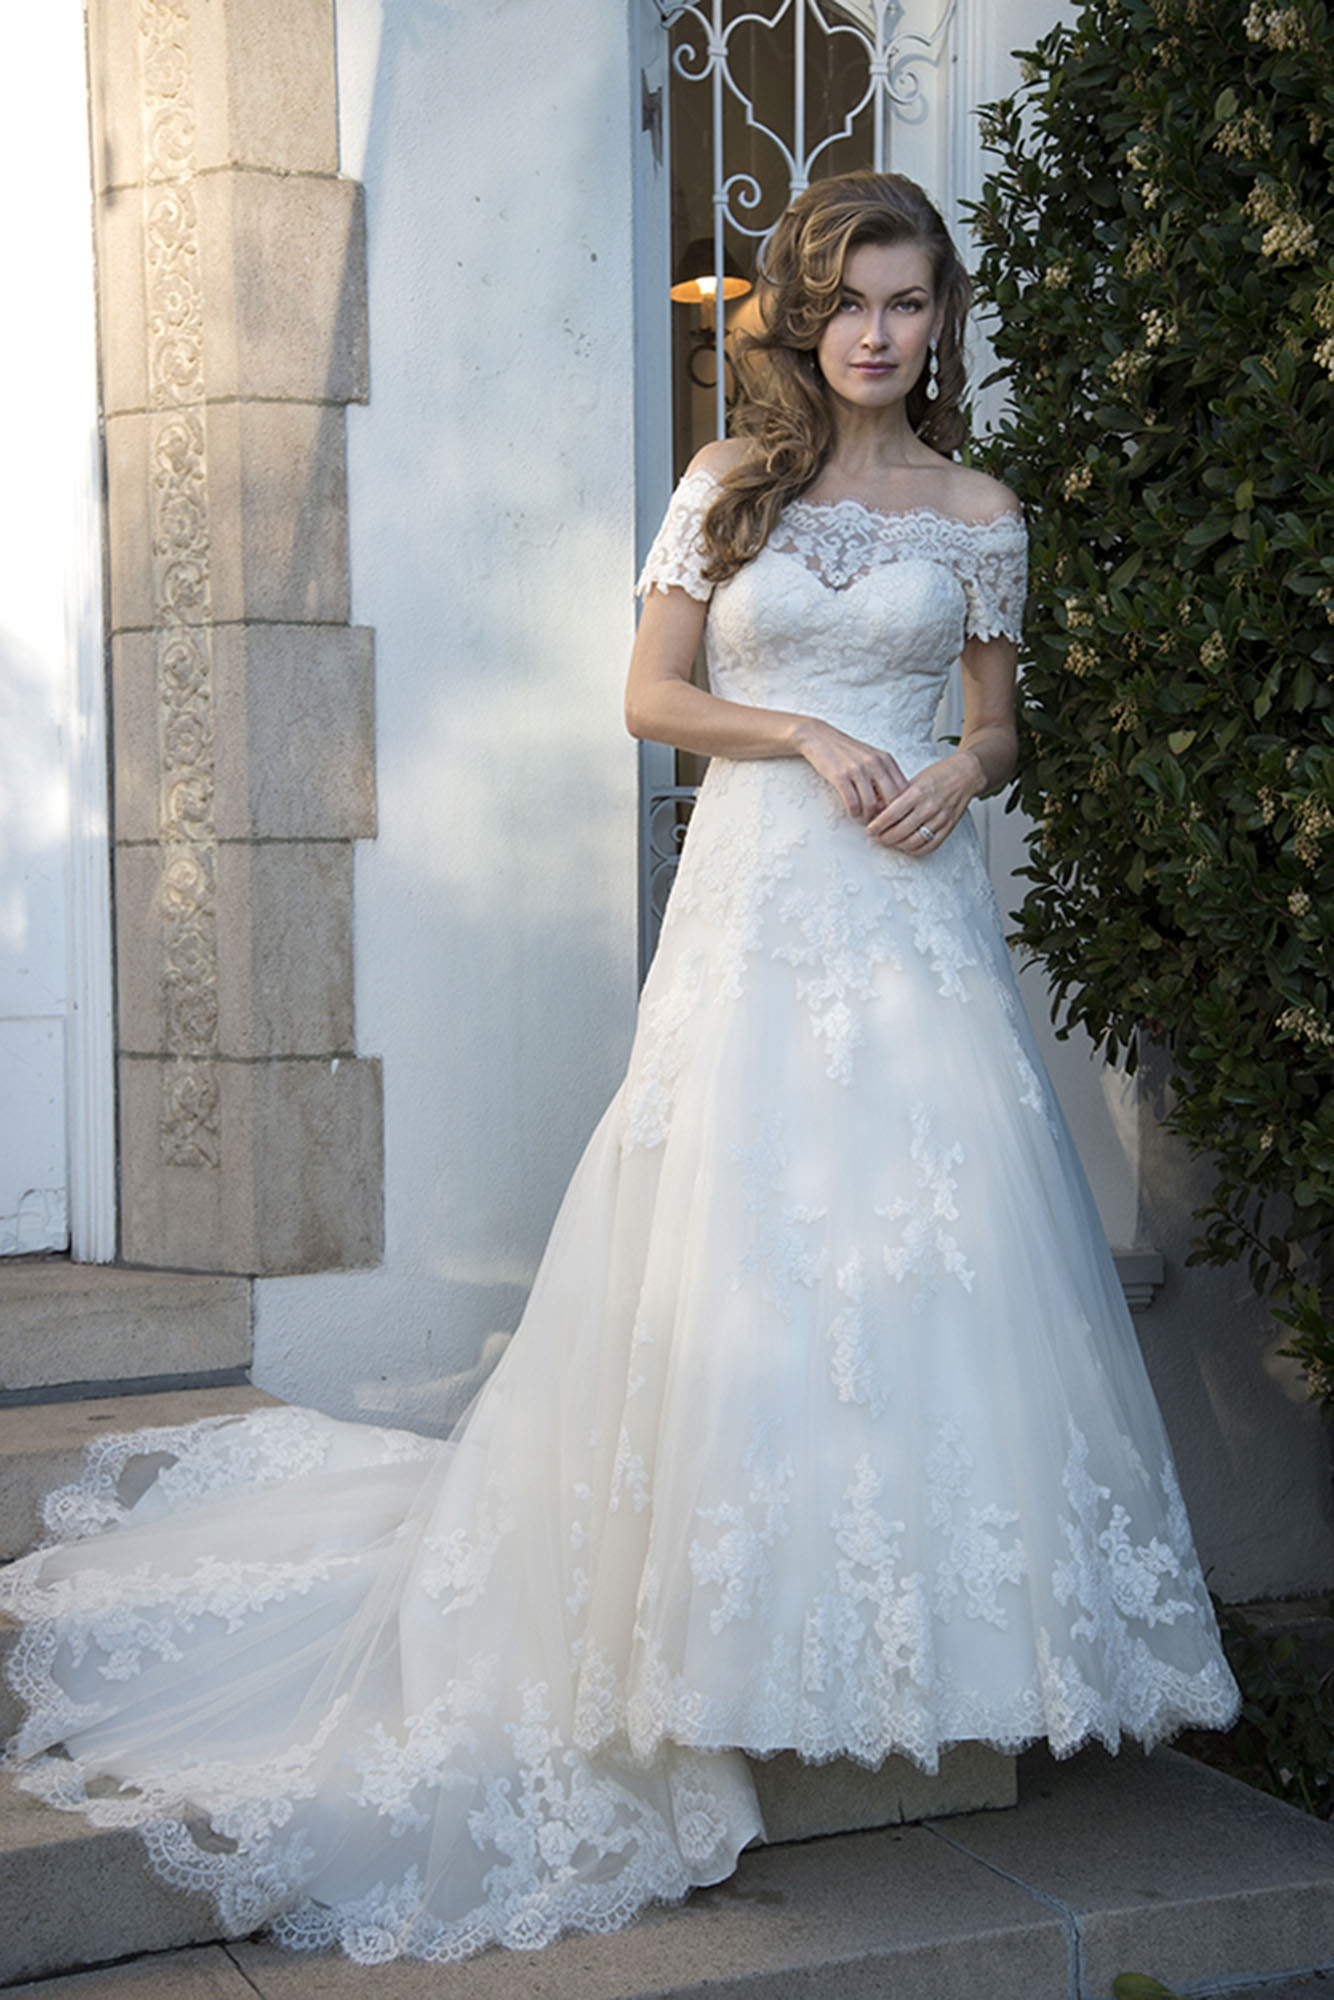 Bridal Dress Norwich | Bridesmaid Dresses Norwich | Childrens ...